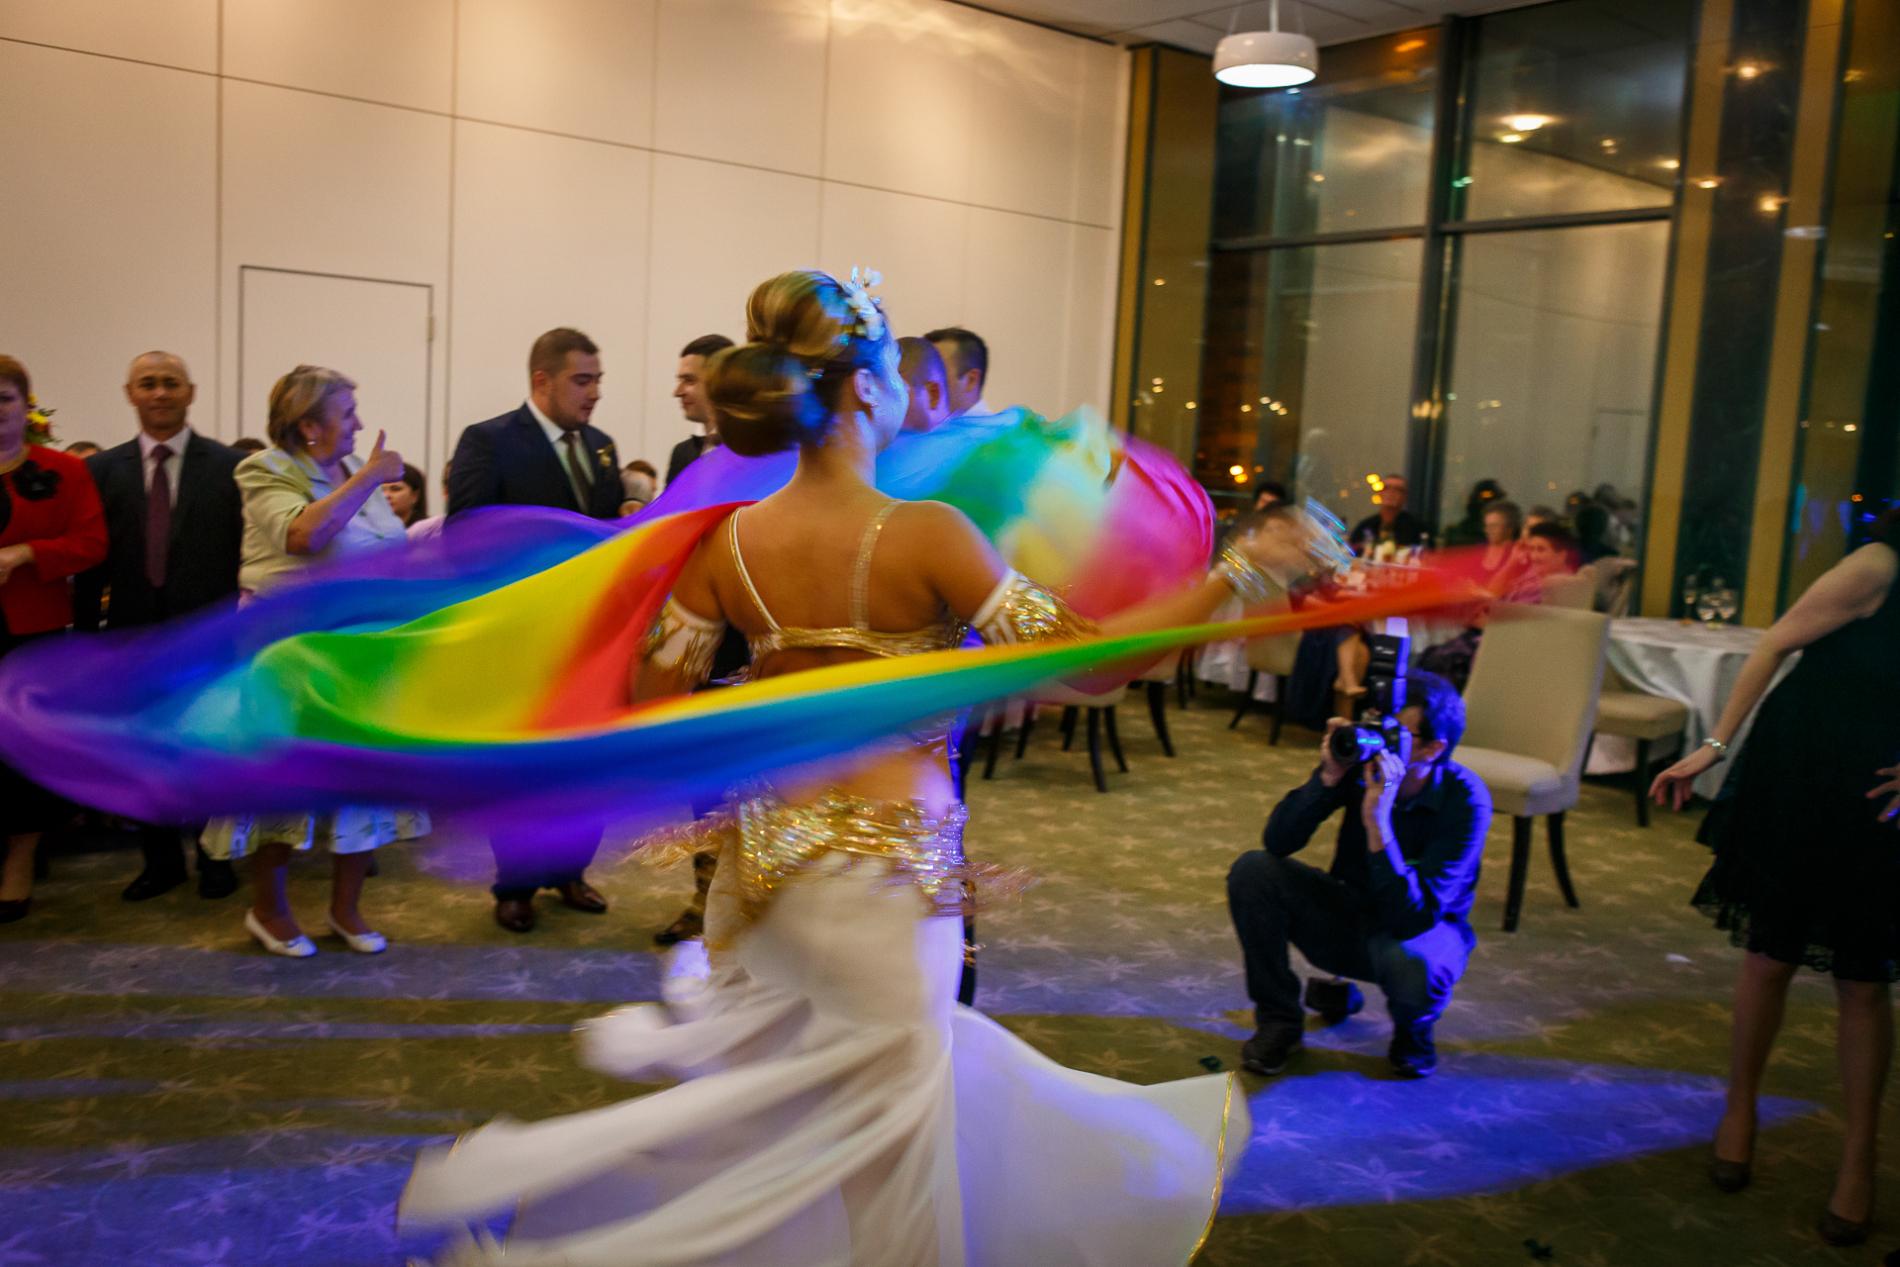 Romania dancing bride images by Mihai Zaharia